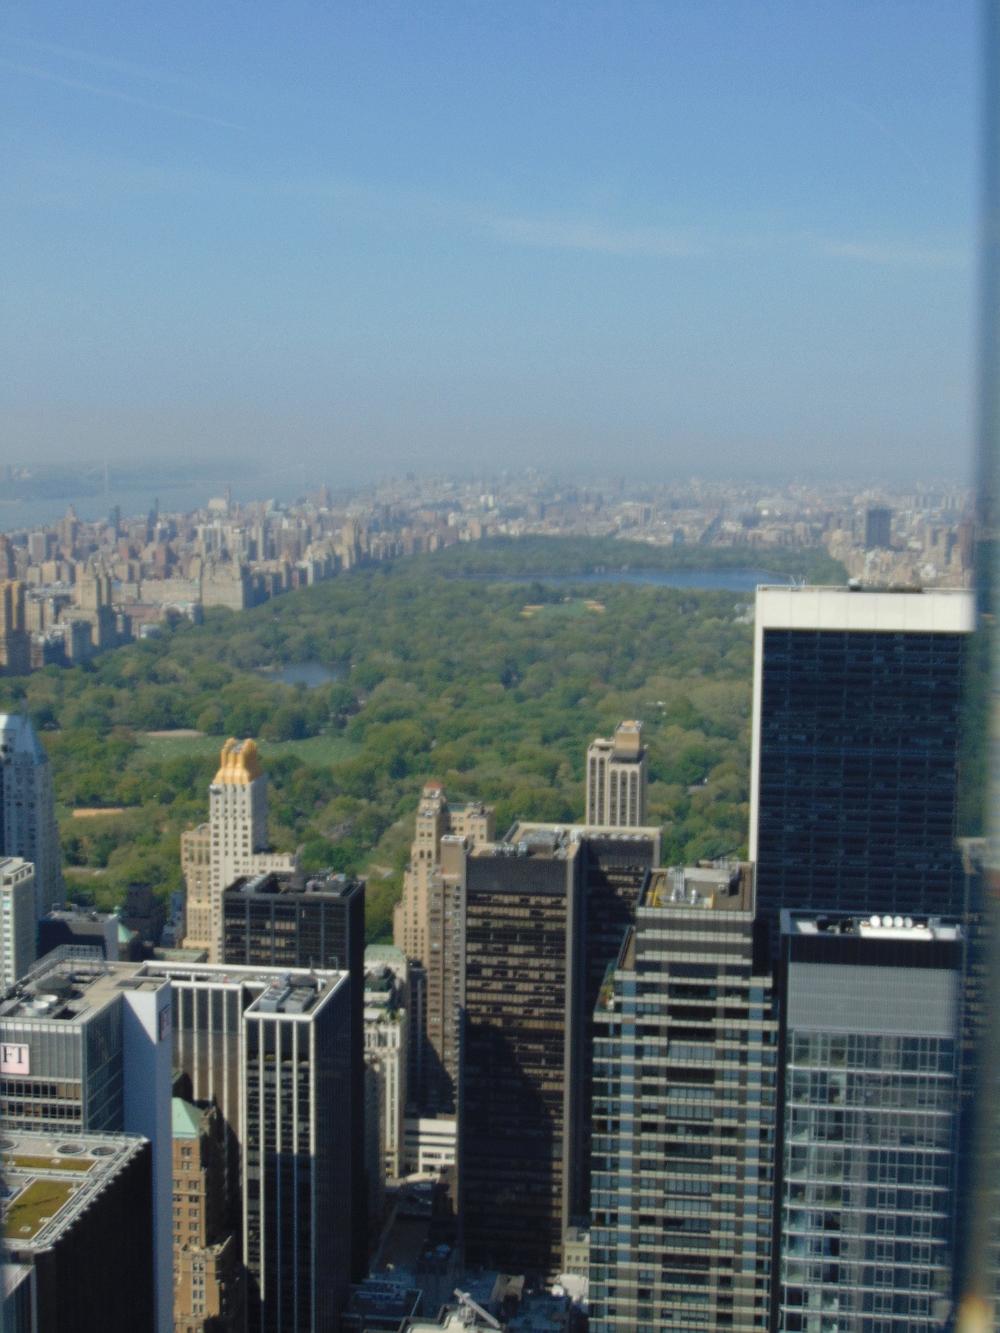 Wondering-Through-New-York-Skyline-Central-Park.JPG